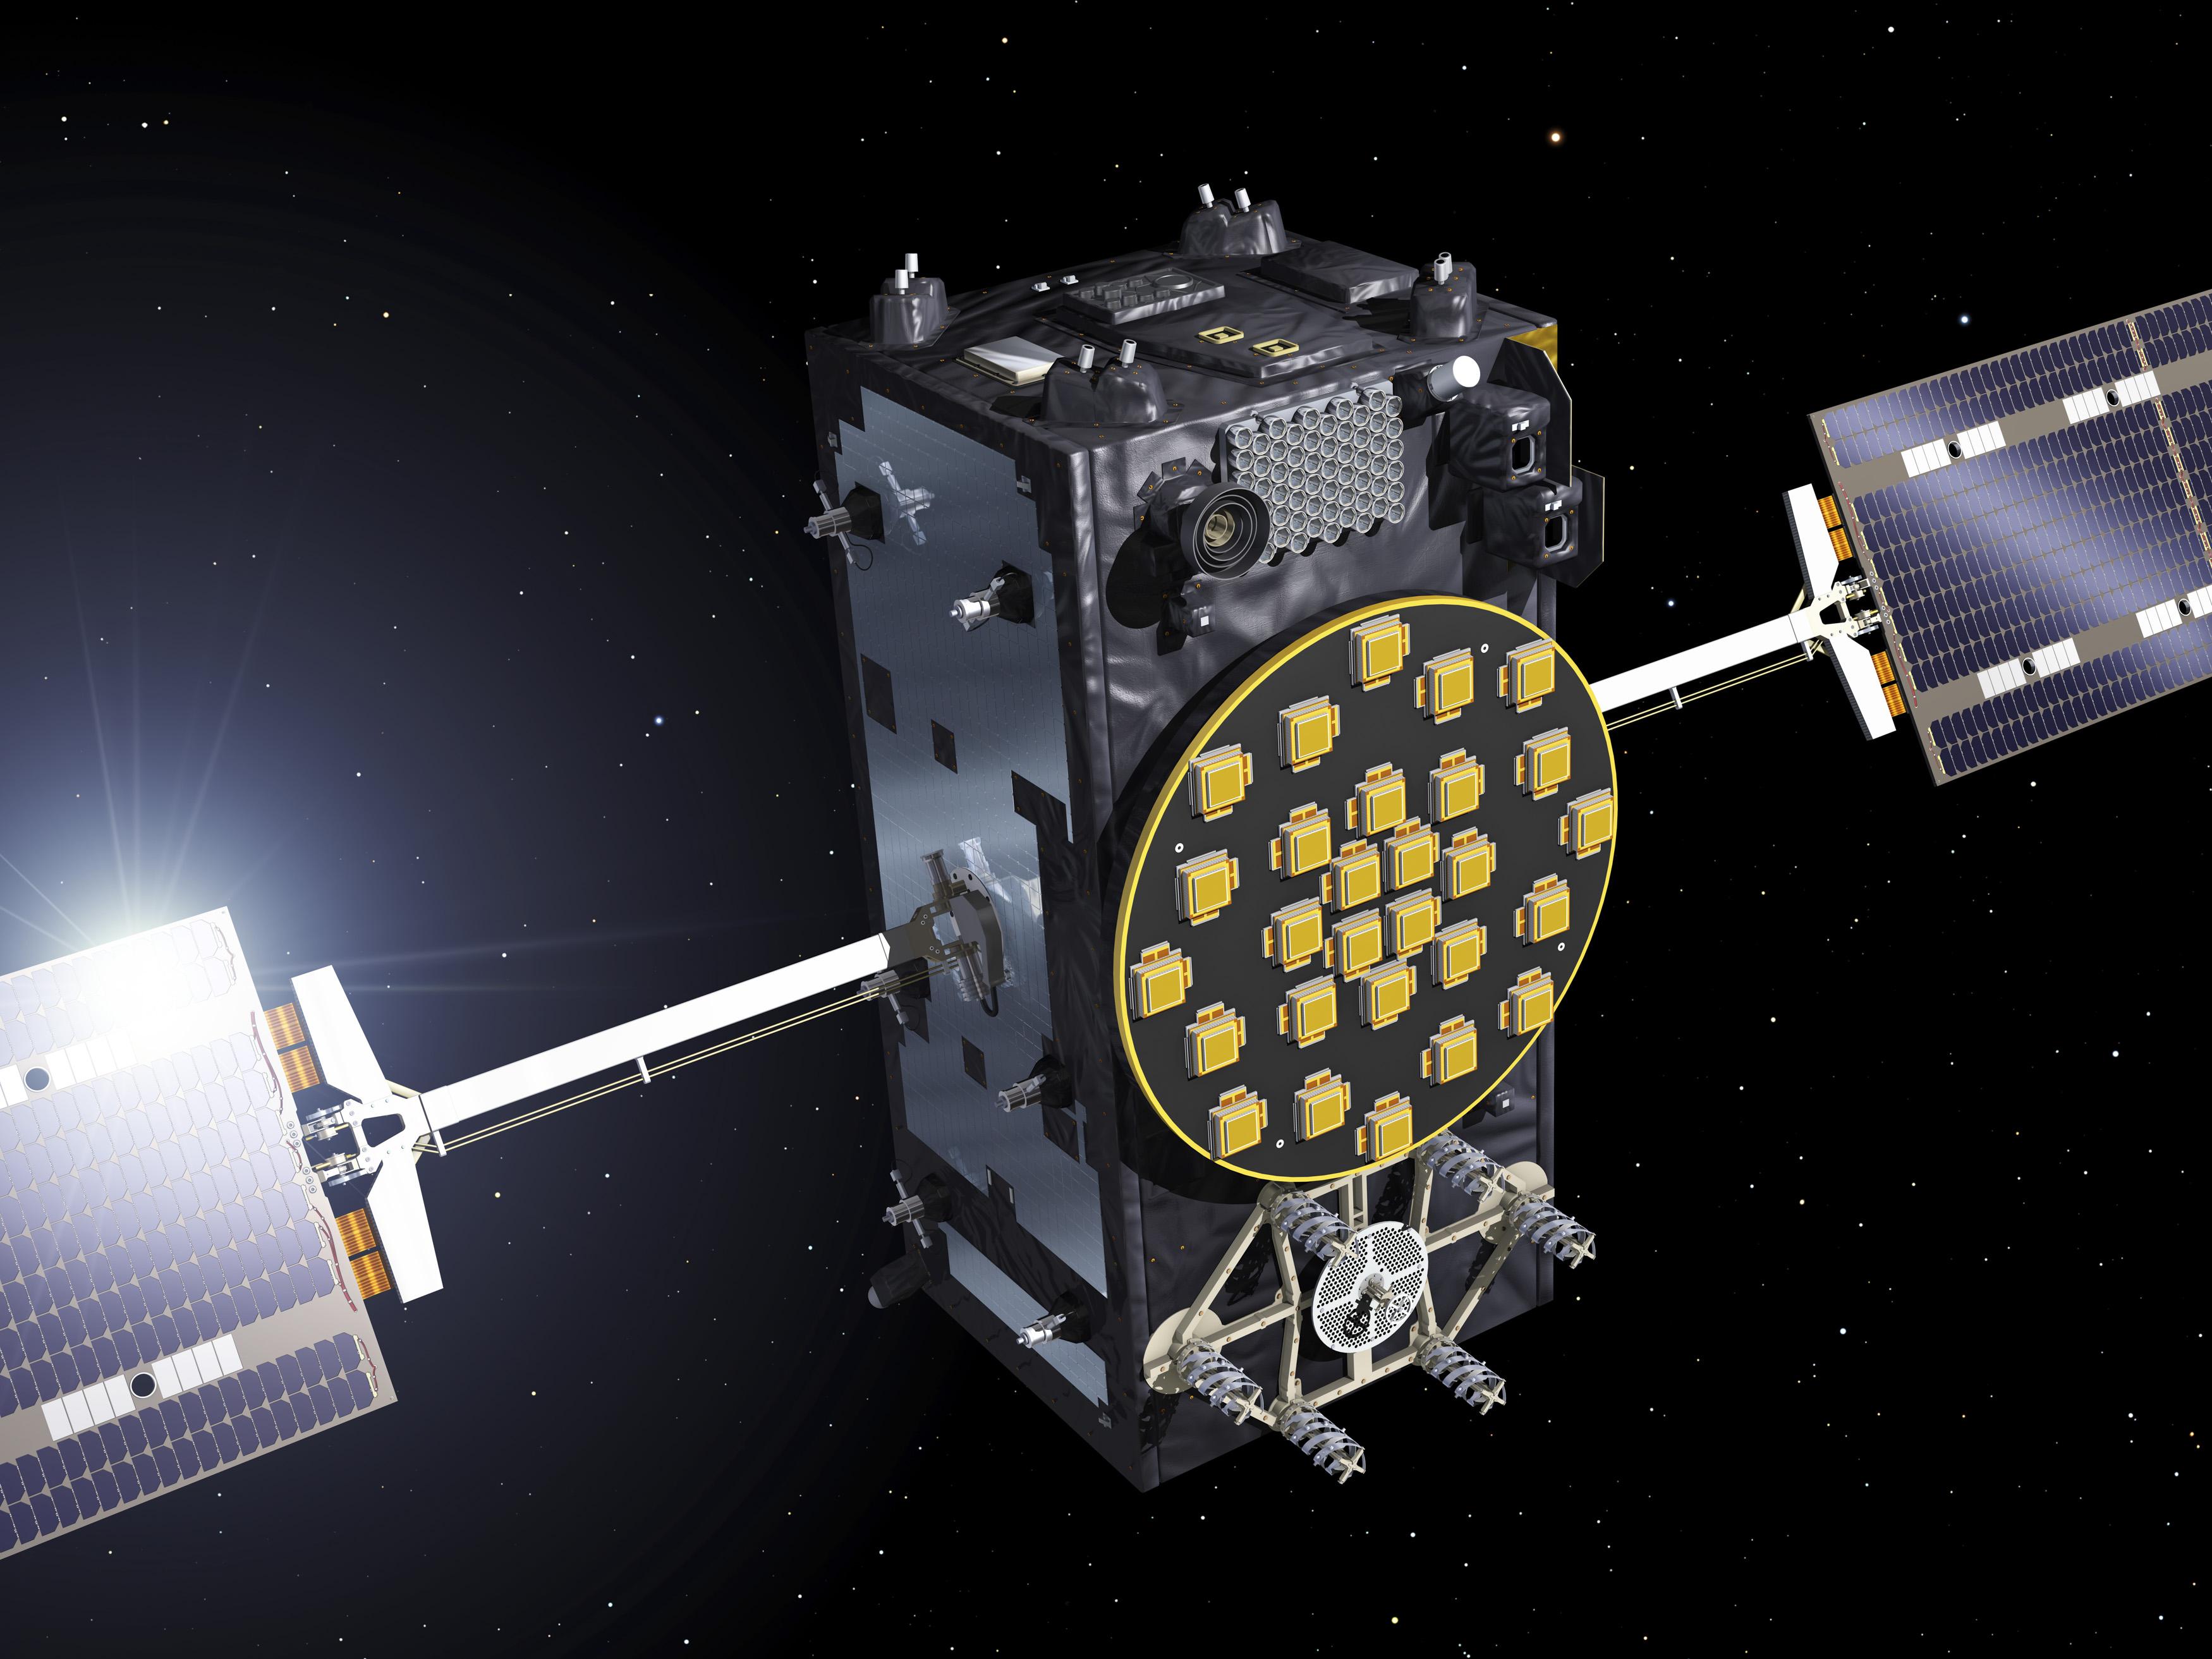 Russian Rocket Launches European Navigation Satellites Into Wrong Orbit